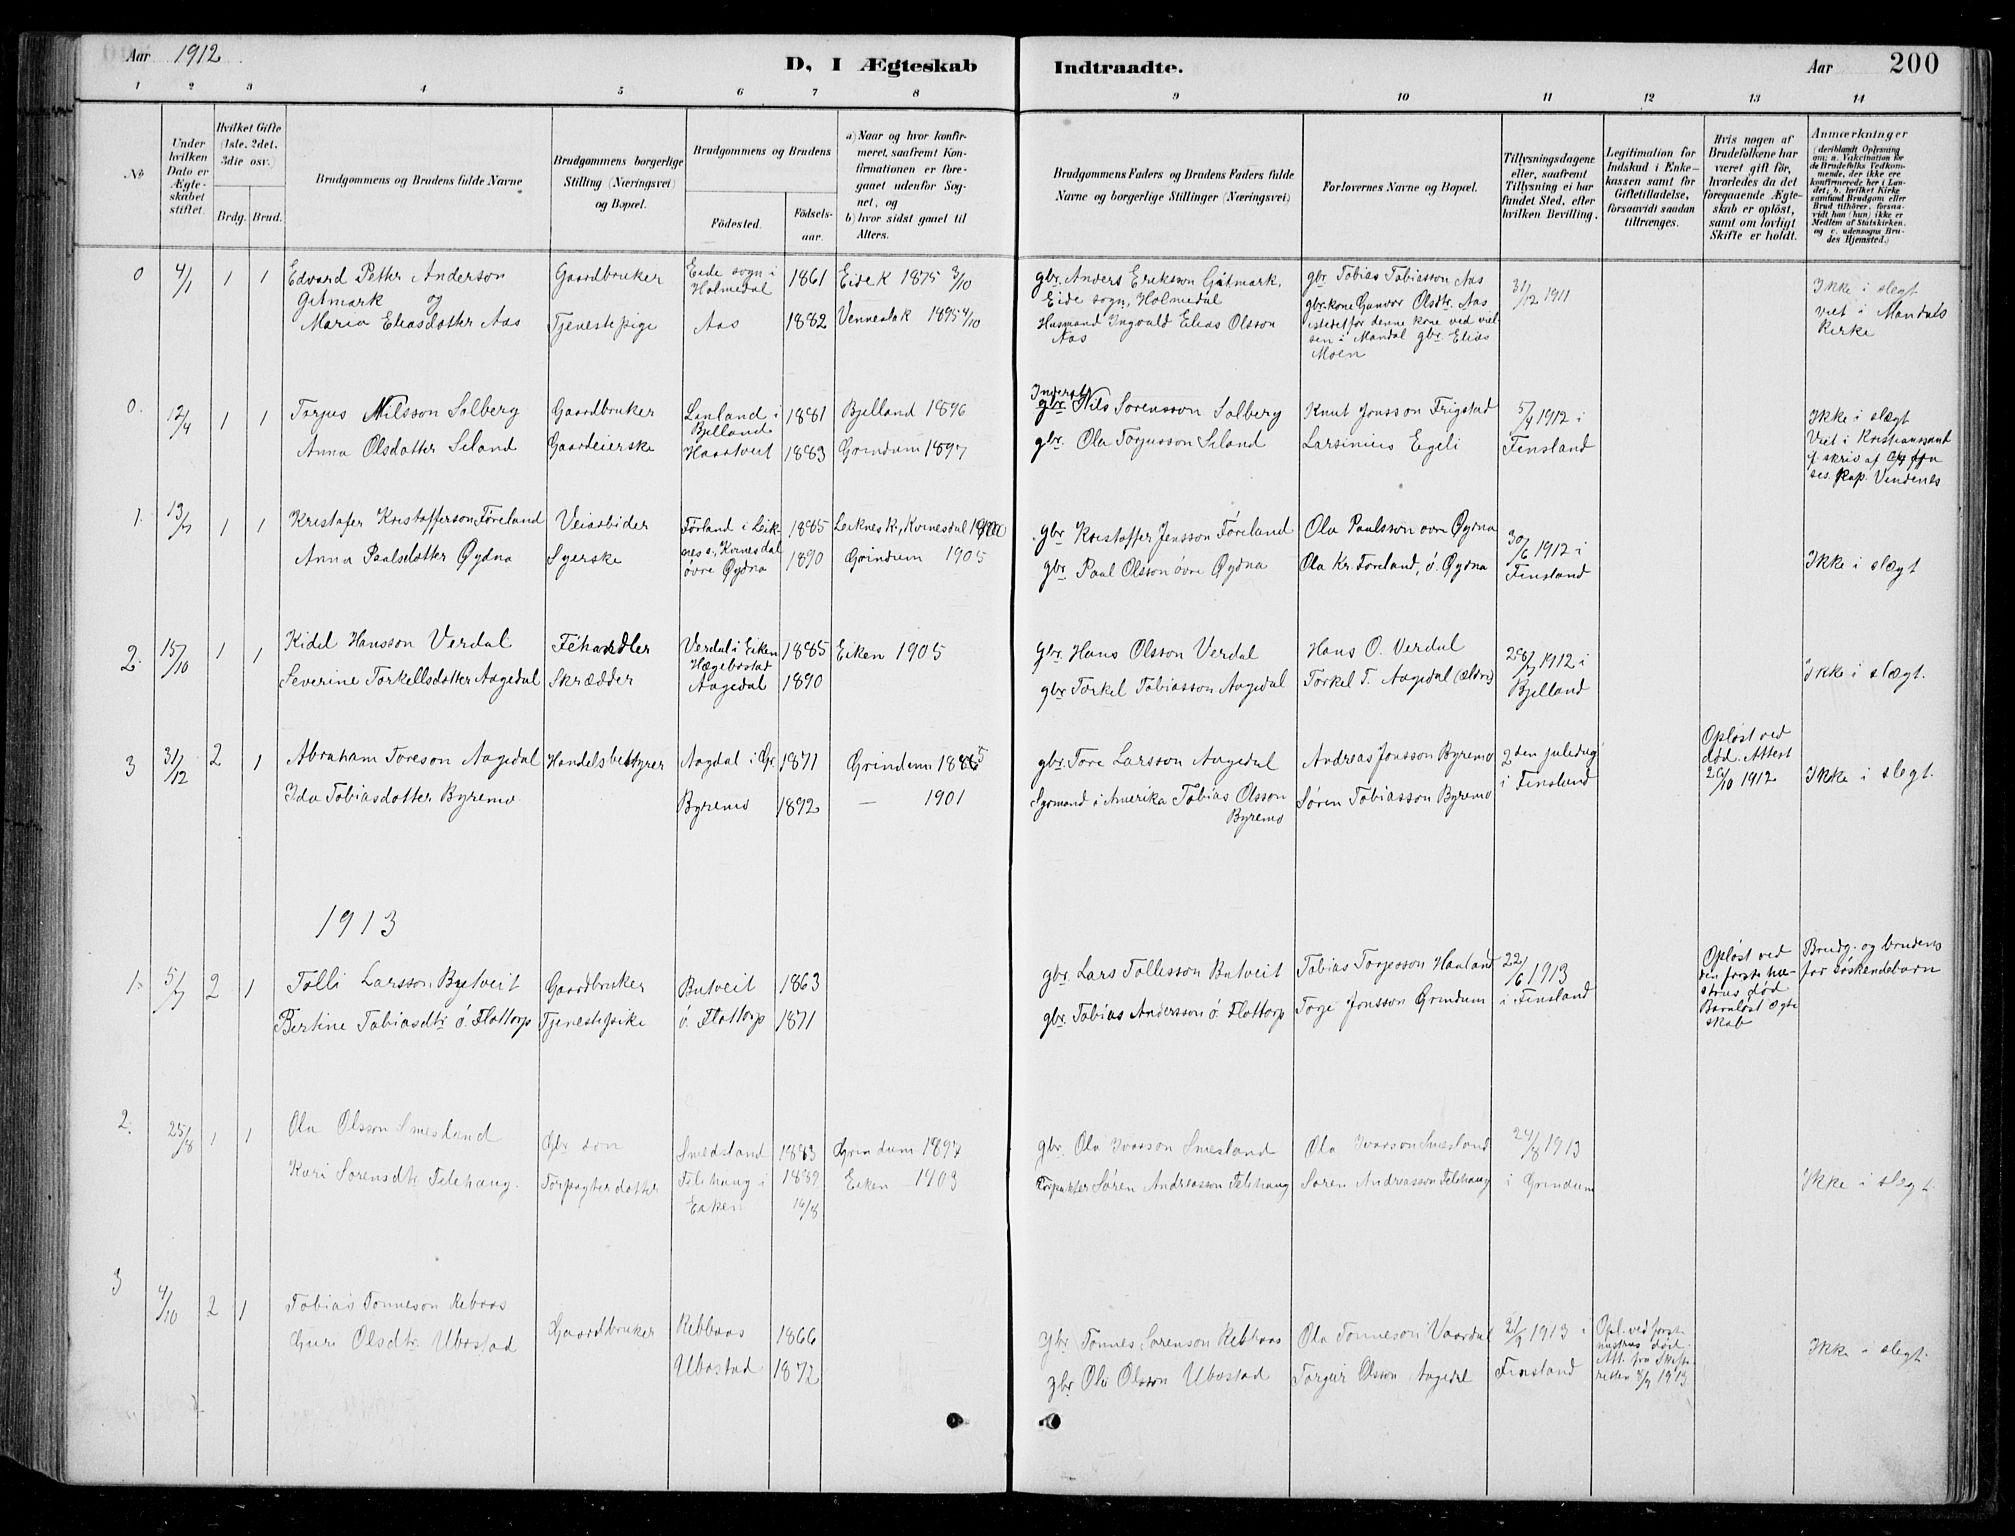 SAK, Bjelland sokneprestkontor, F/Fb/Fbc/L0003: Klokkerbok nr. B 3, 1887-1924, s. 200